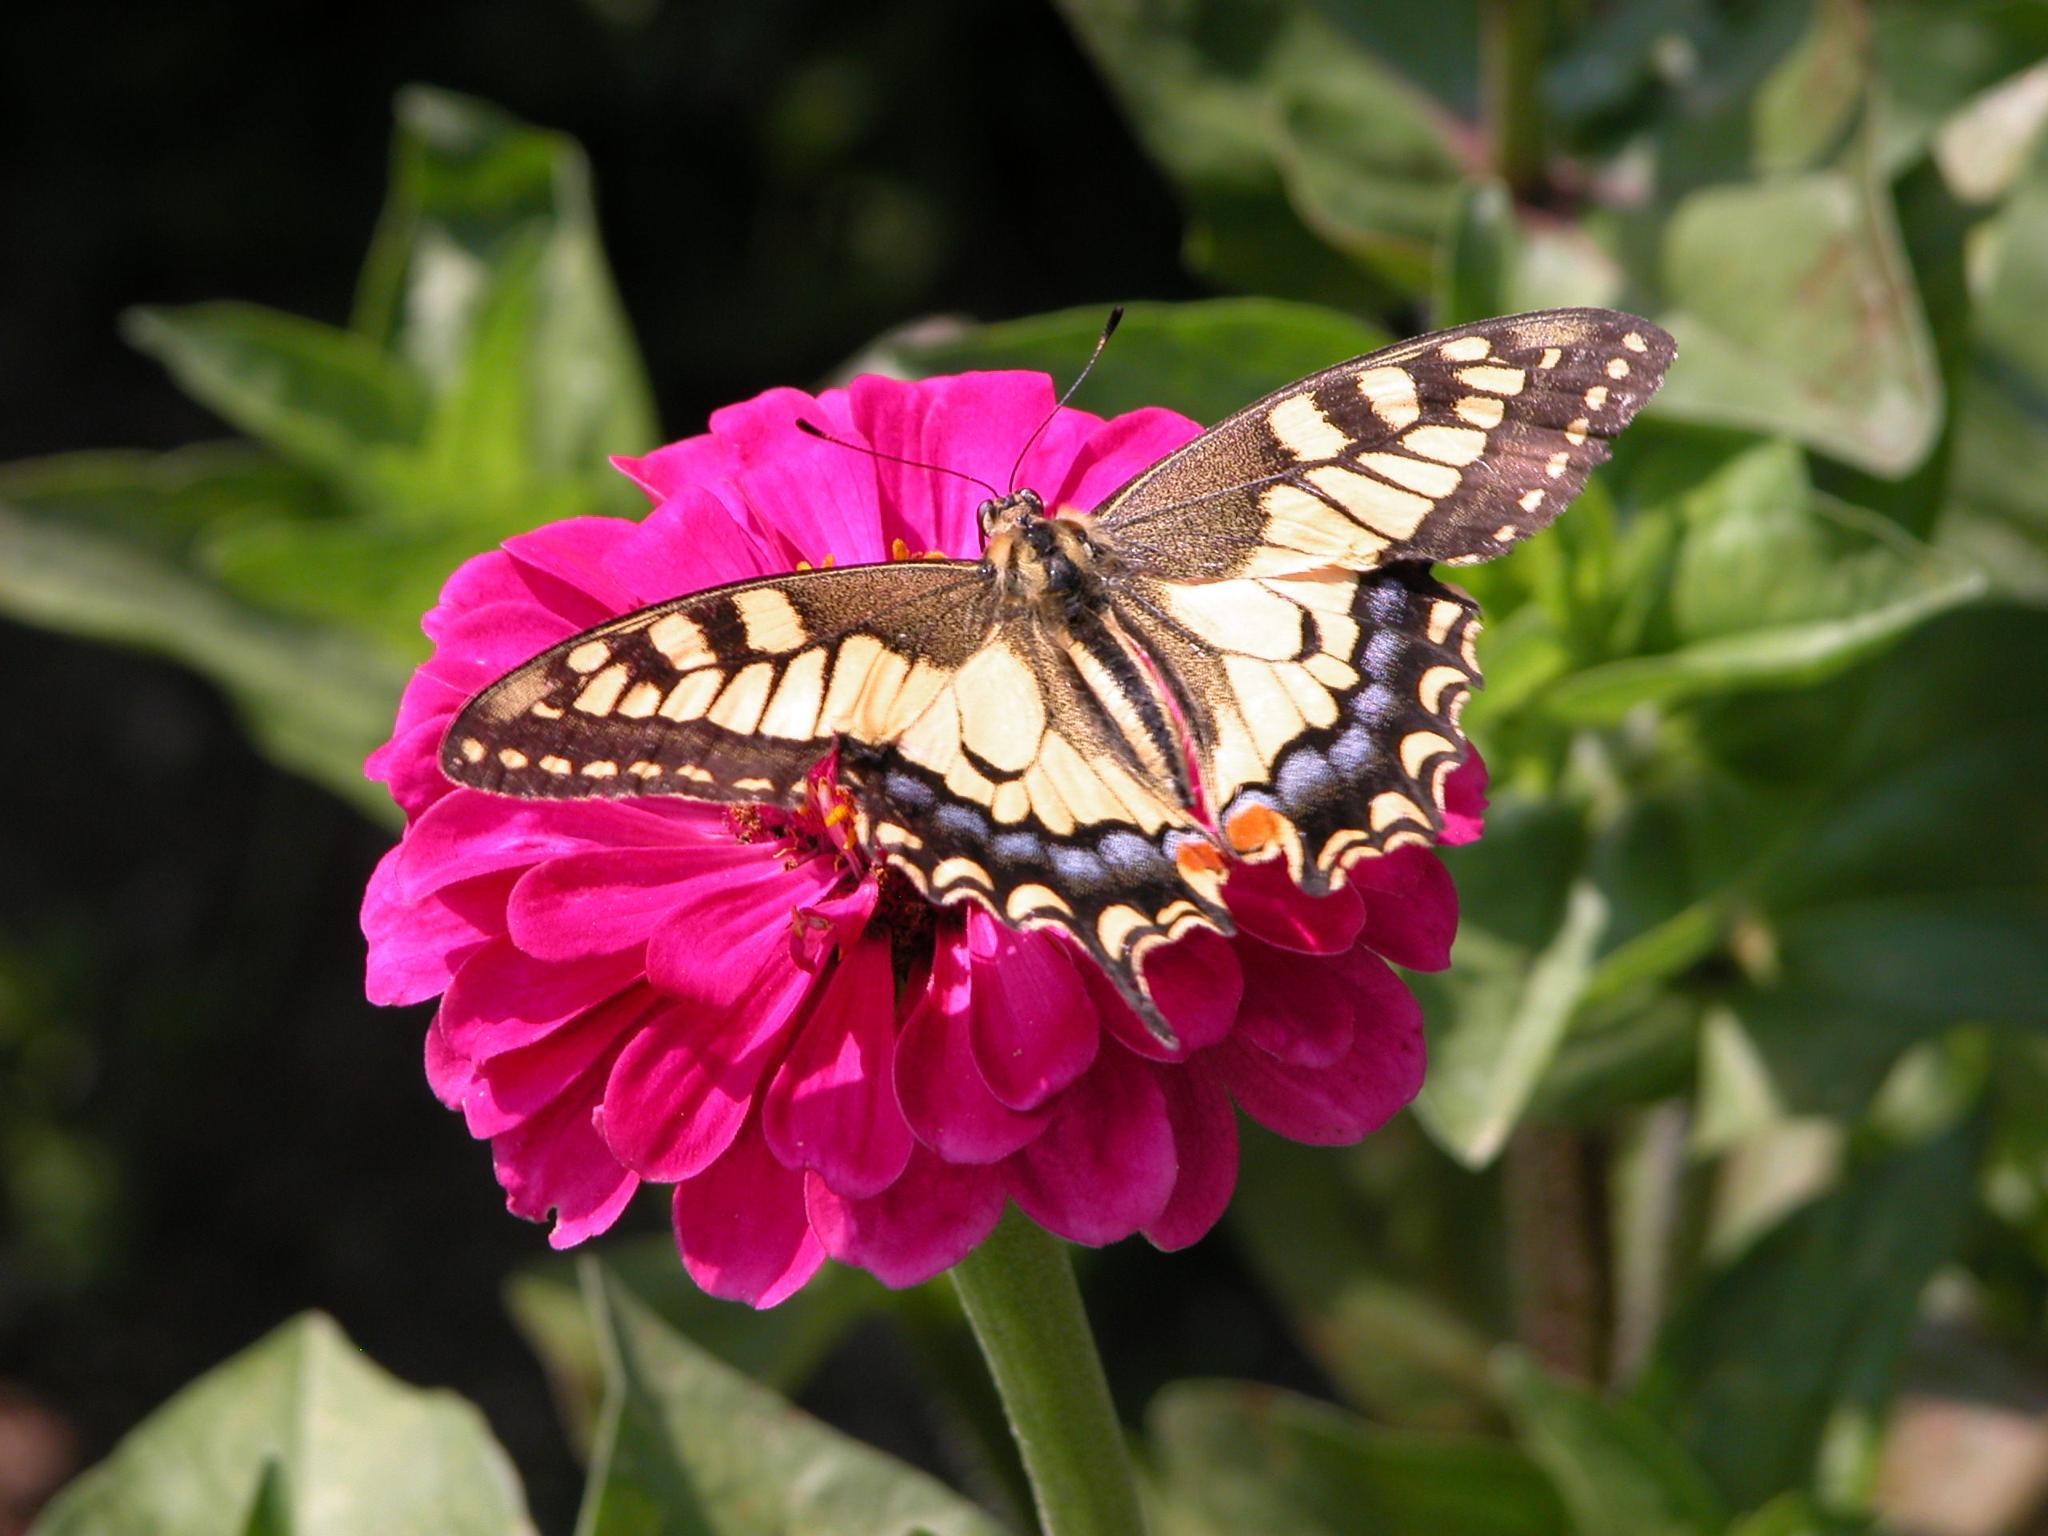 Butterfly on the flower by Ahmed Meštrovac